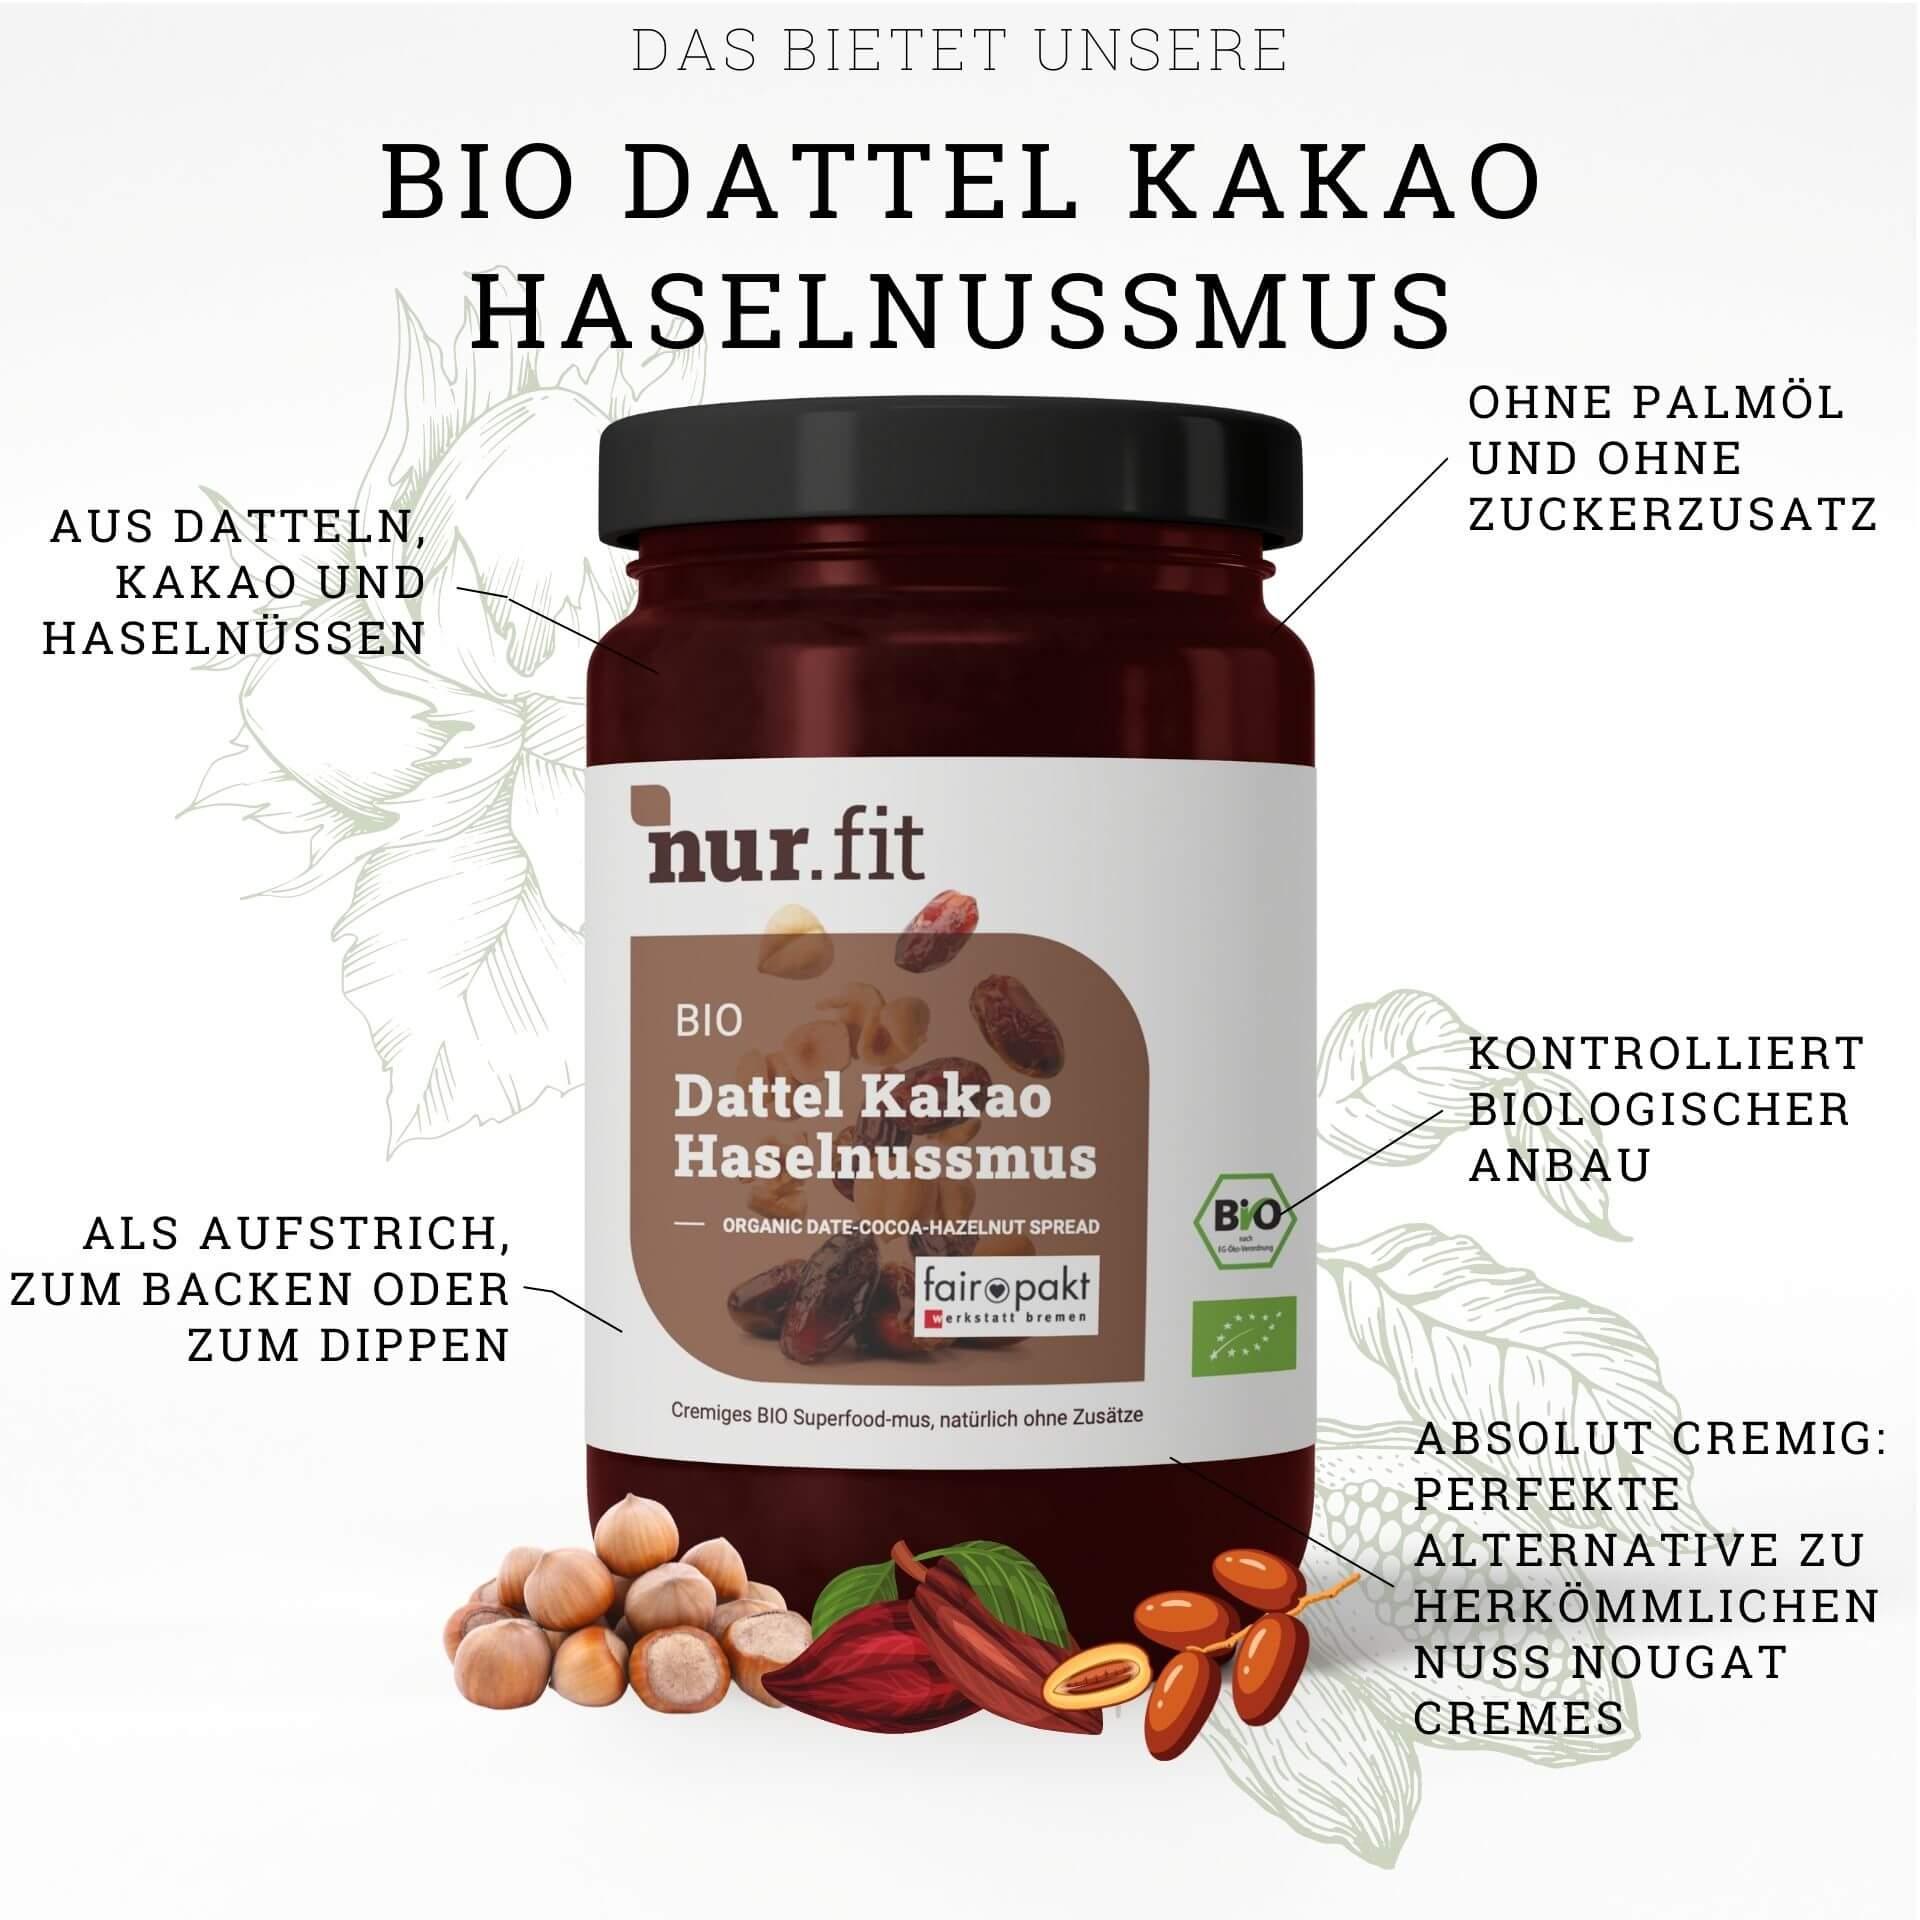 BIO Dattel Kakao Haselnuss Creme